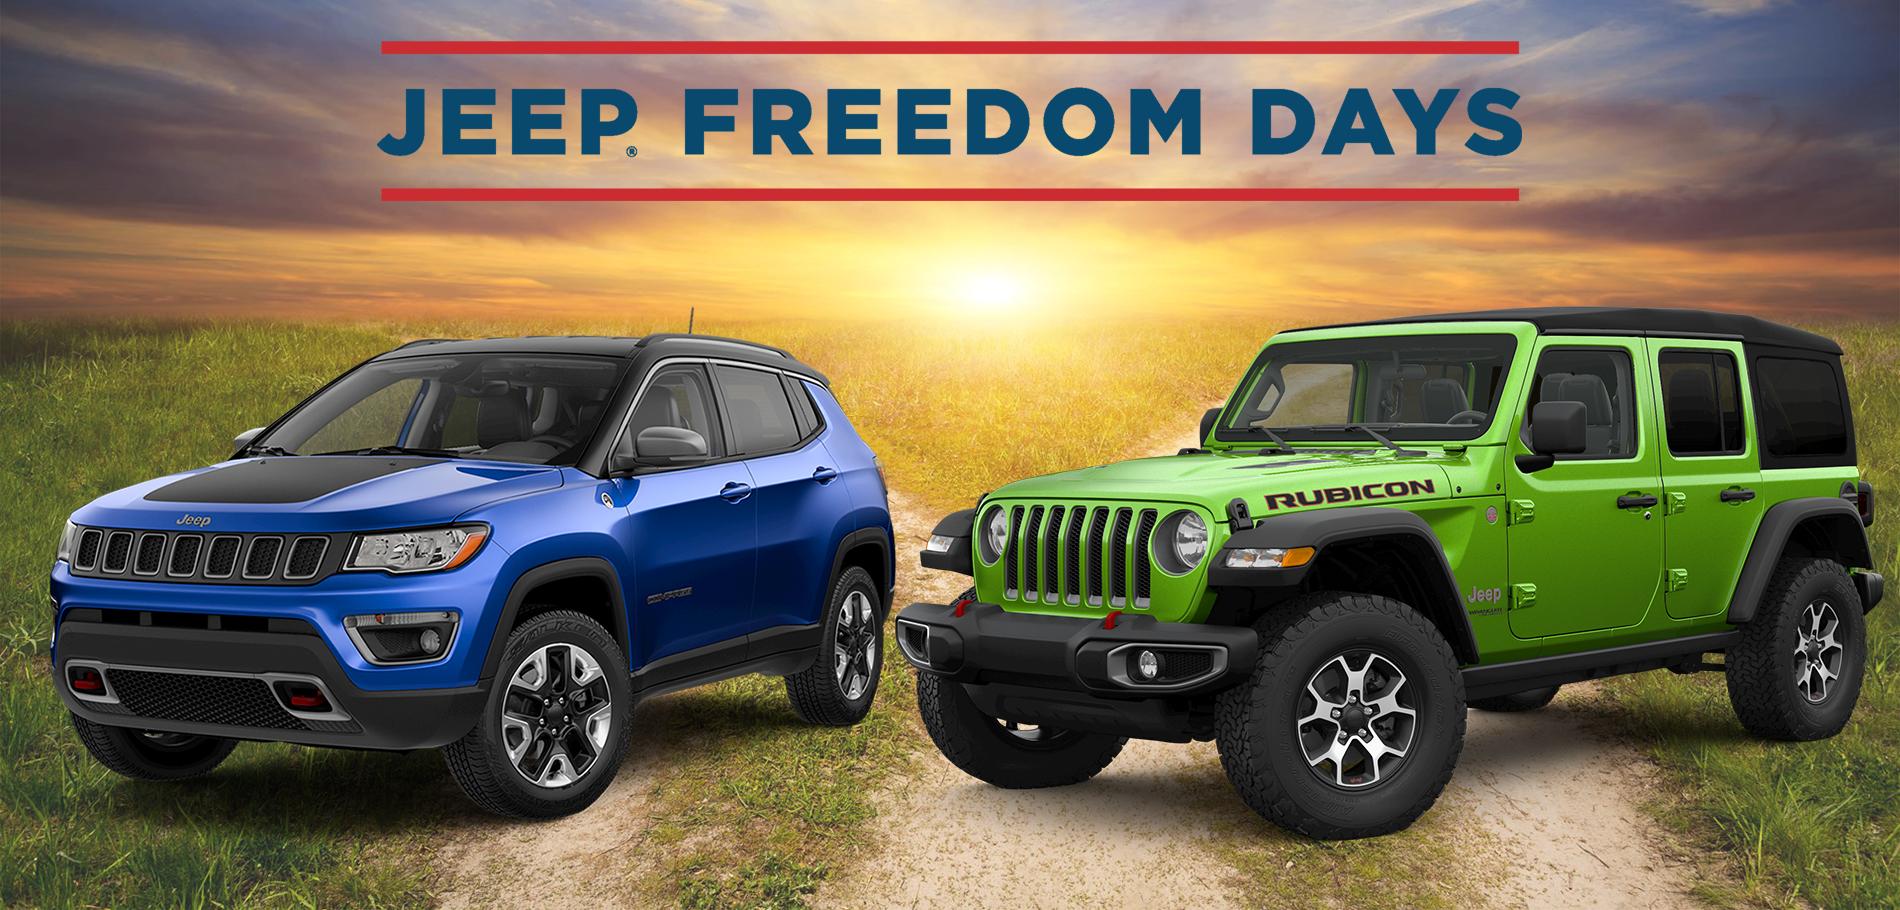 19 Jeep Freedom